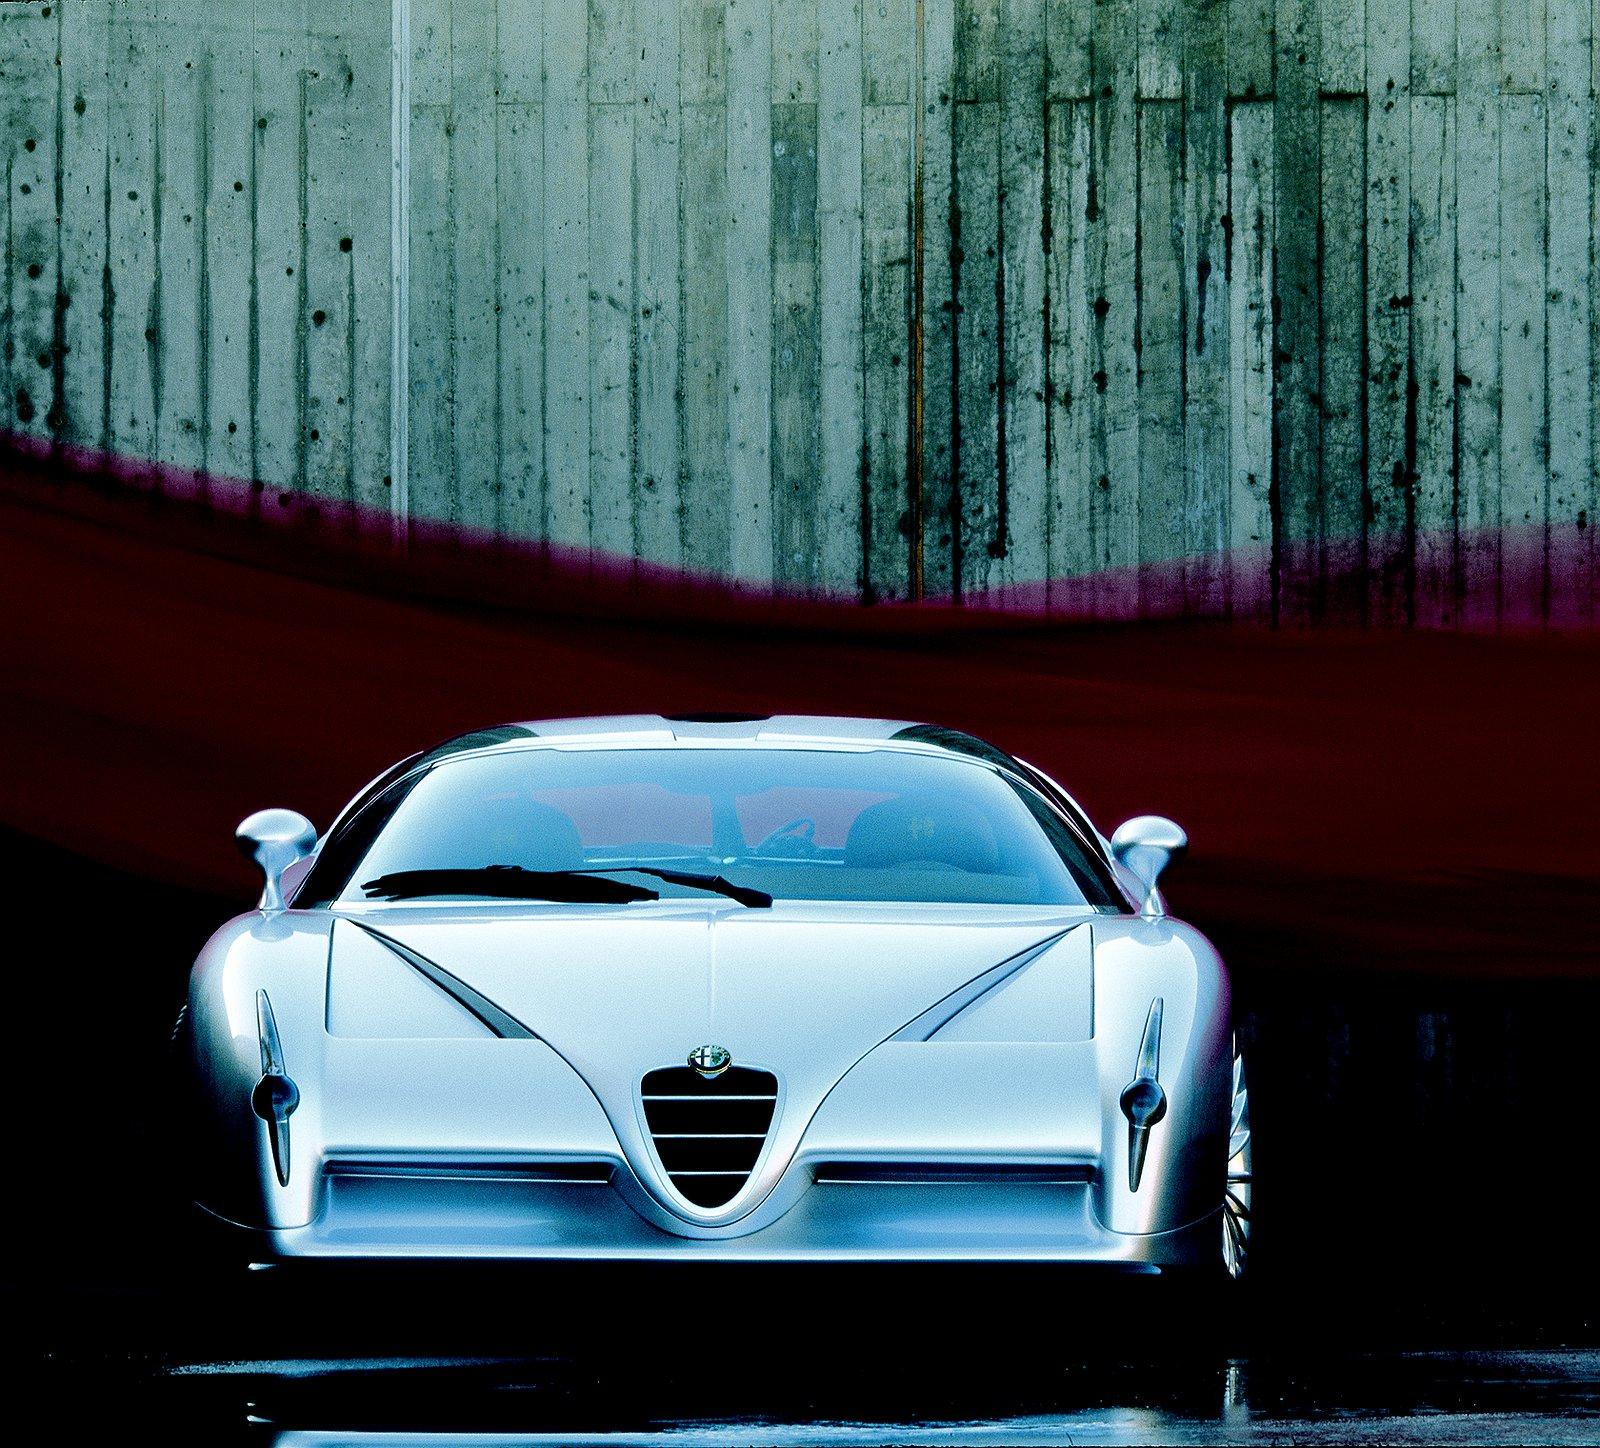 Cars in addition Alfa Romeo Scighera as well Flashback Salon De Geneve 1997 293623 further Alfa Romeo Scighera 1997 additionally Alfa Romeo. on italdesign scighera